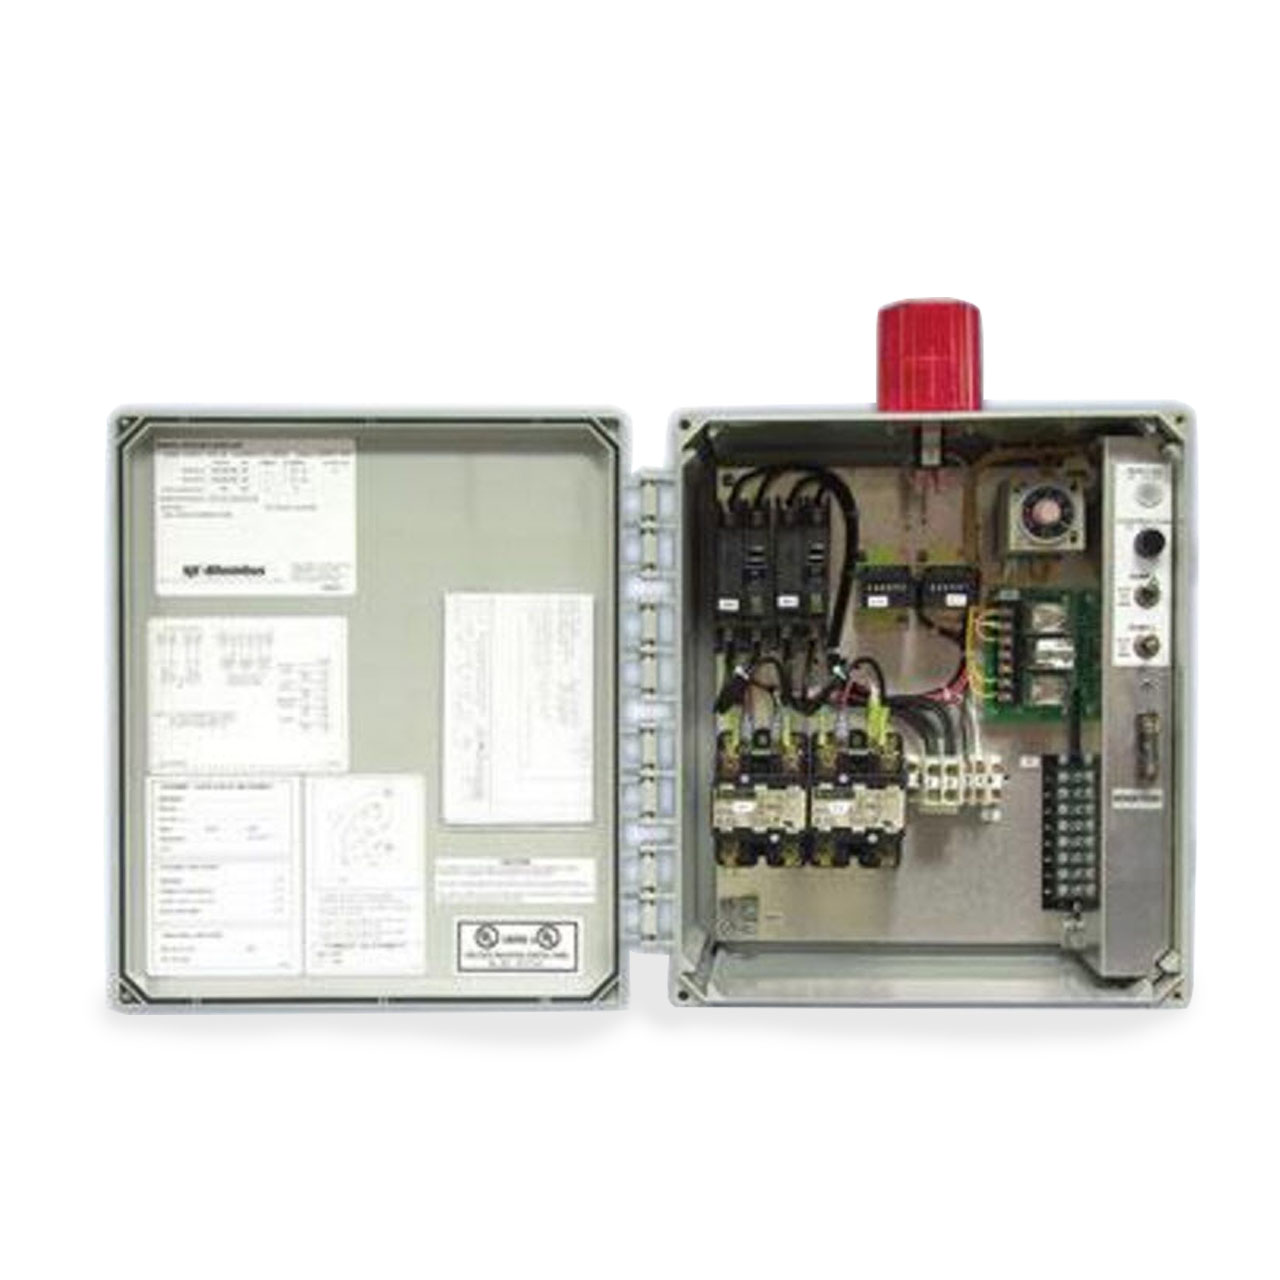 hight resolution of sje rhombus sje rhombus model dtd timed dosing duplex 120 208 240 vac single phase motor contactor control panel cp sjedtd